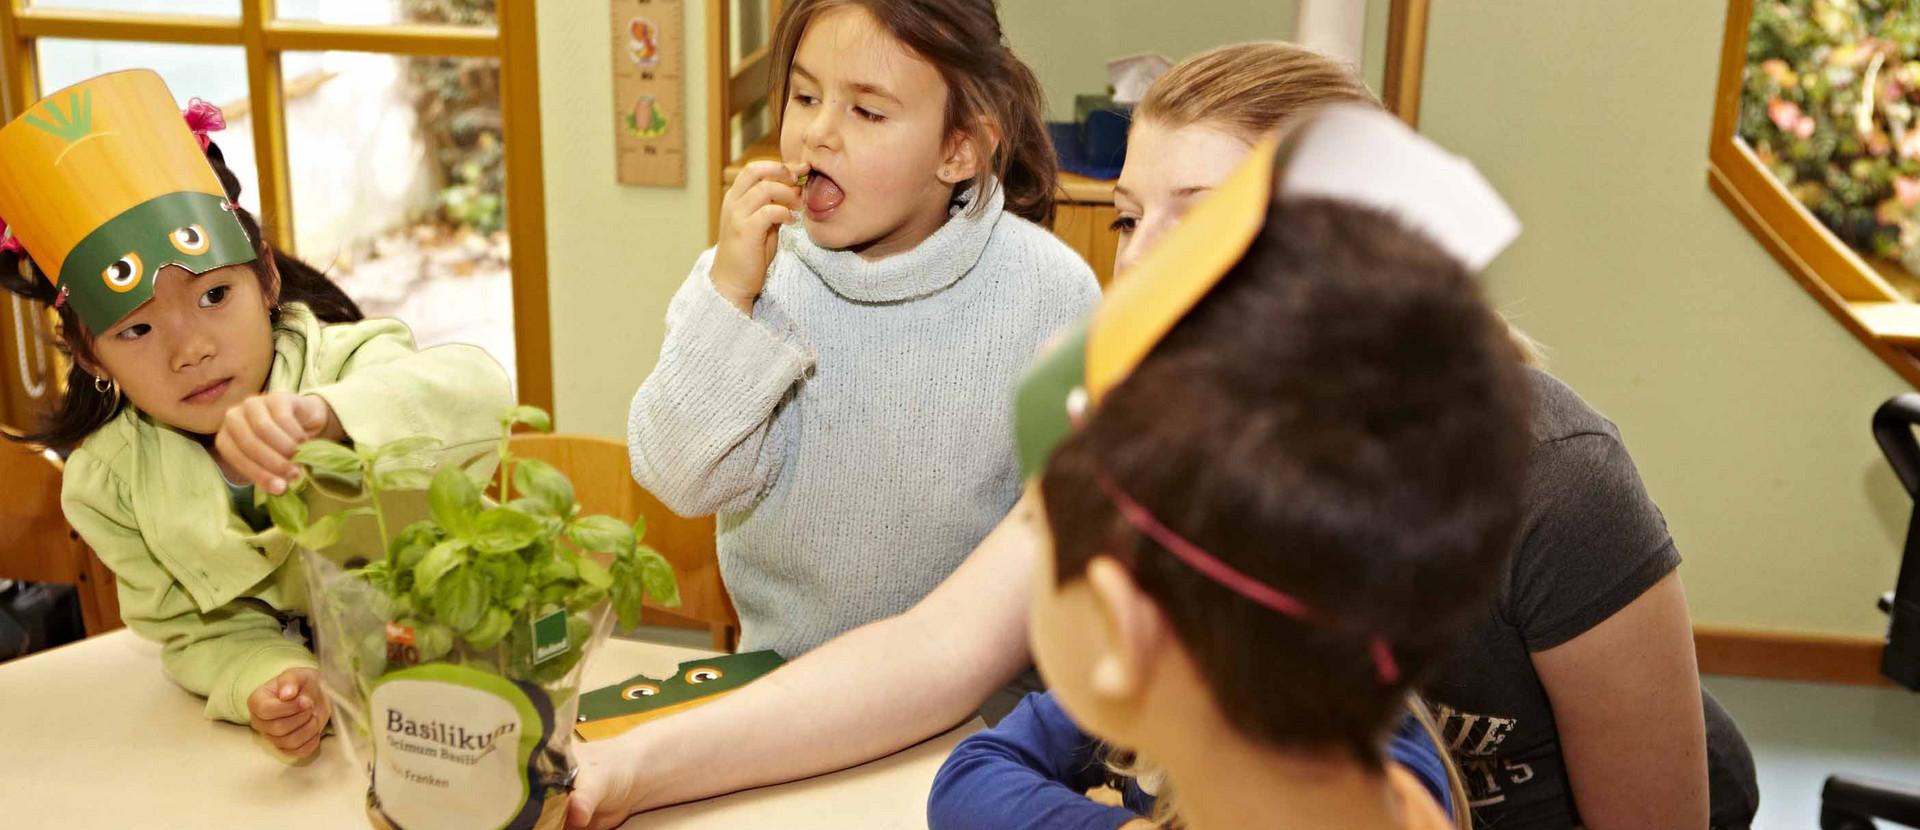 Kinder kosten Basilikum